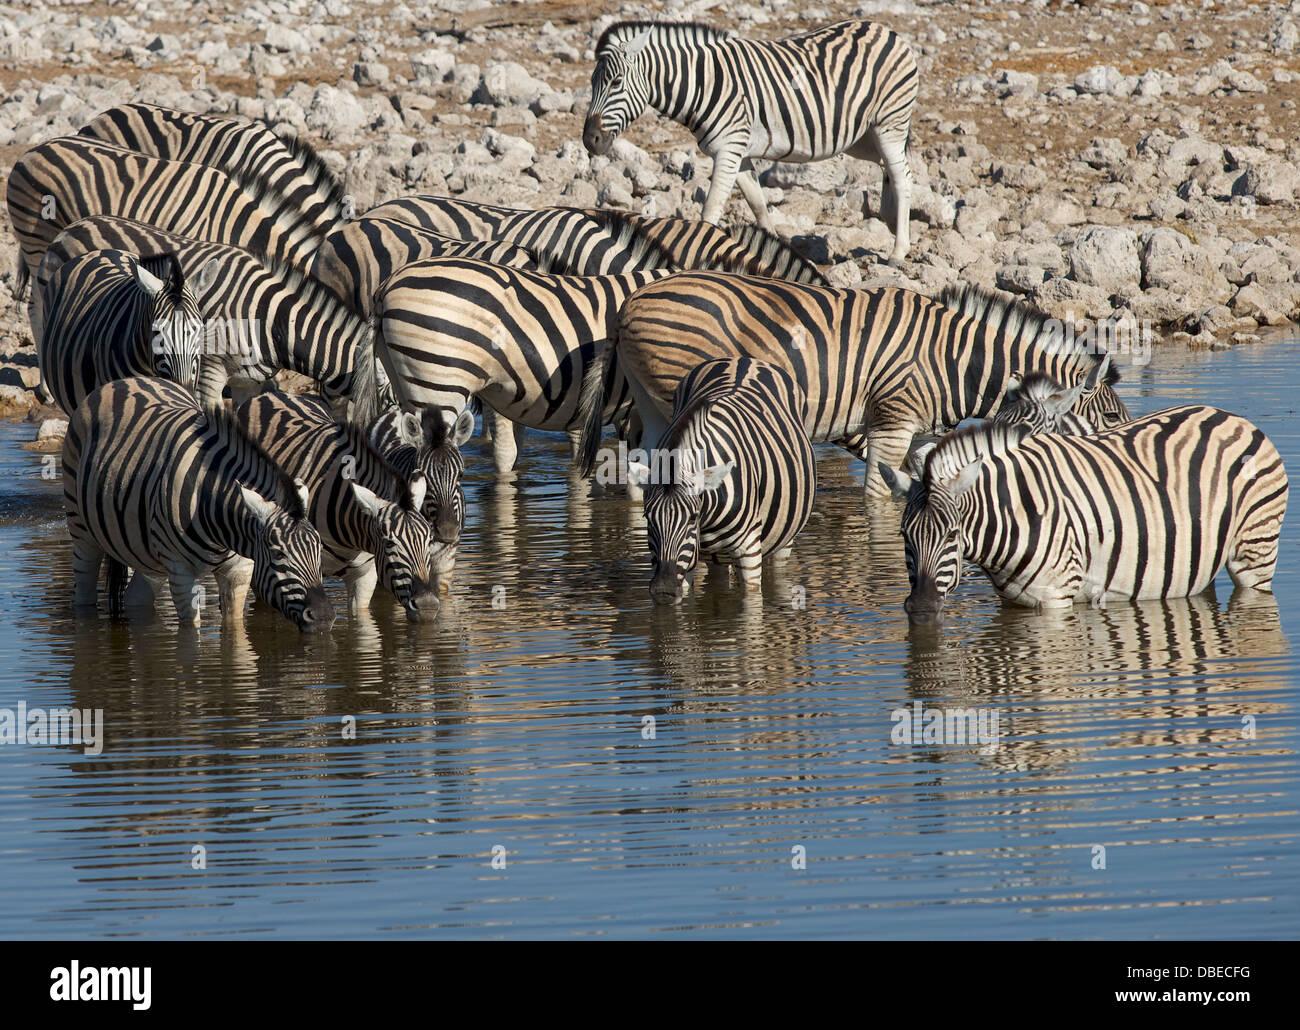 burchell's  Zebra drinking from watering hole in Okaukuejo Etosha National park Namibia Africa - Stock Image